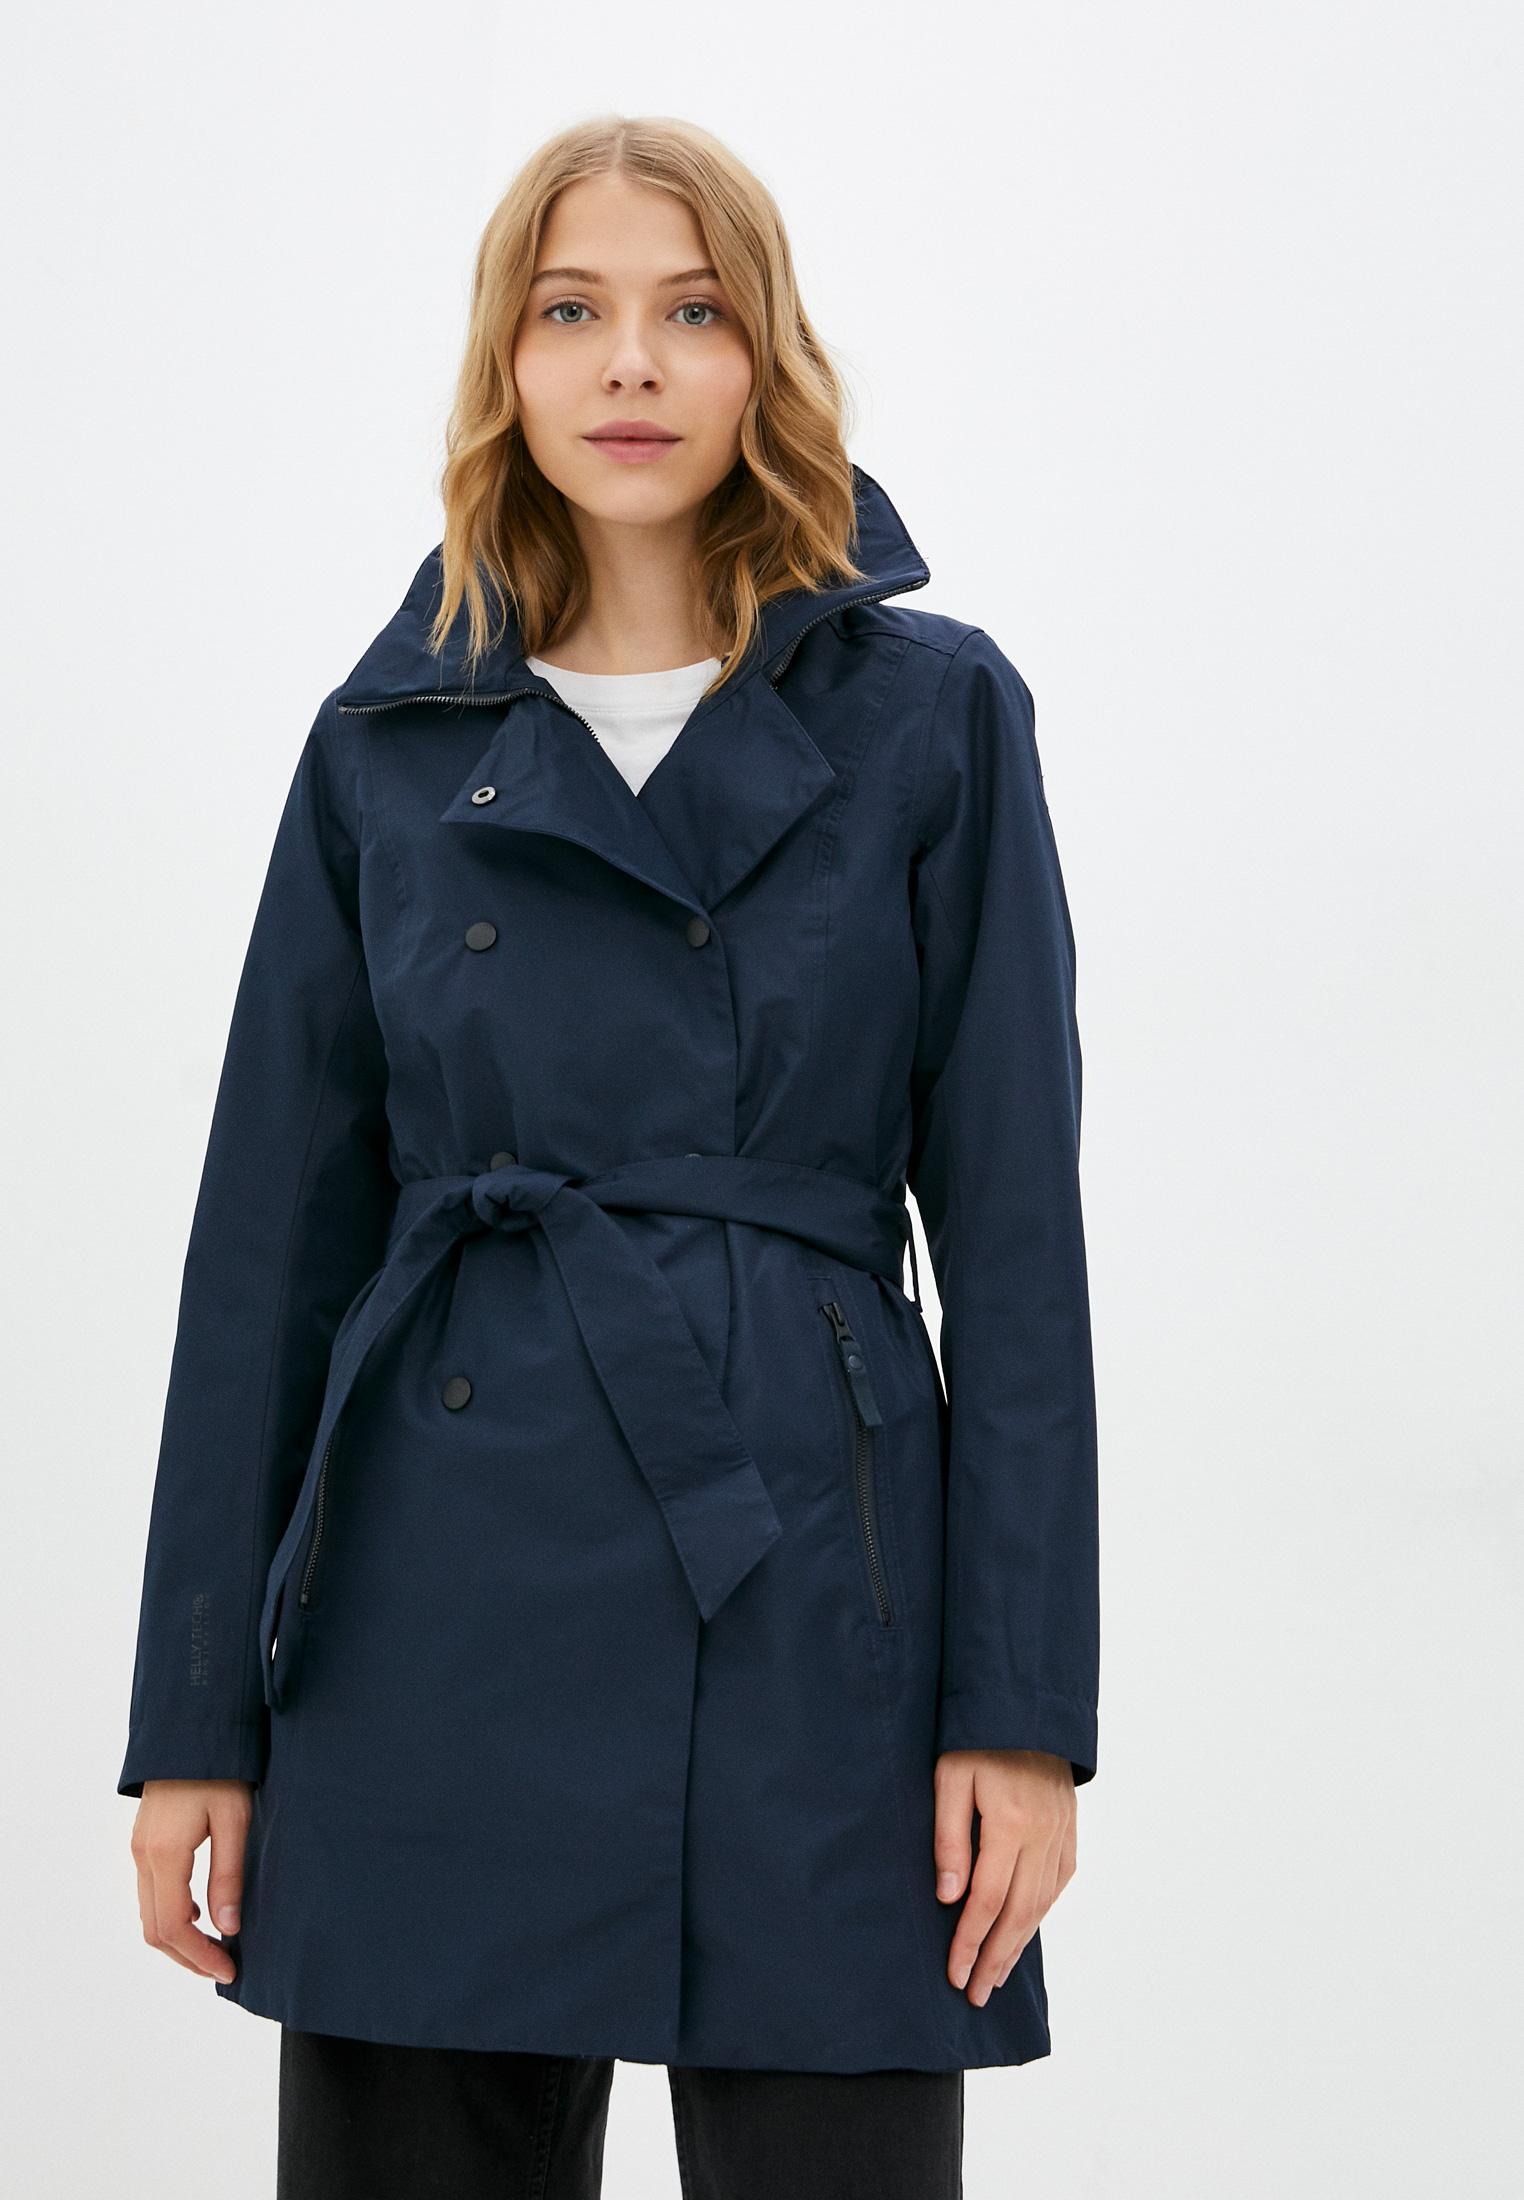 Женская верхняя одежда Helly Hansen (Хелли Хансен) 53314